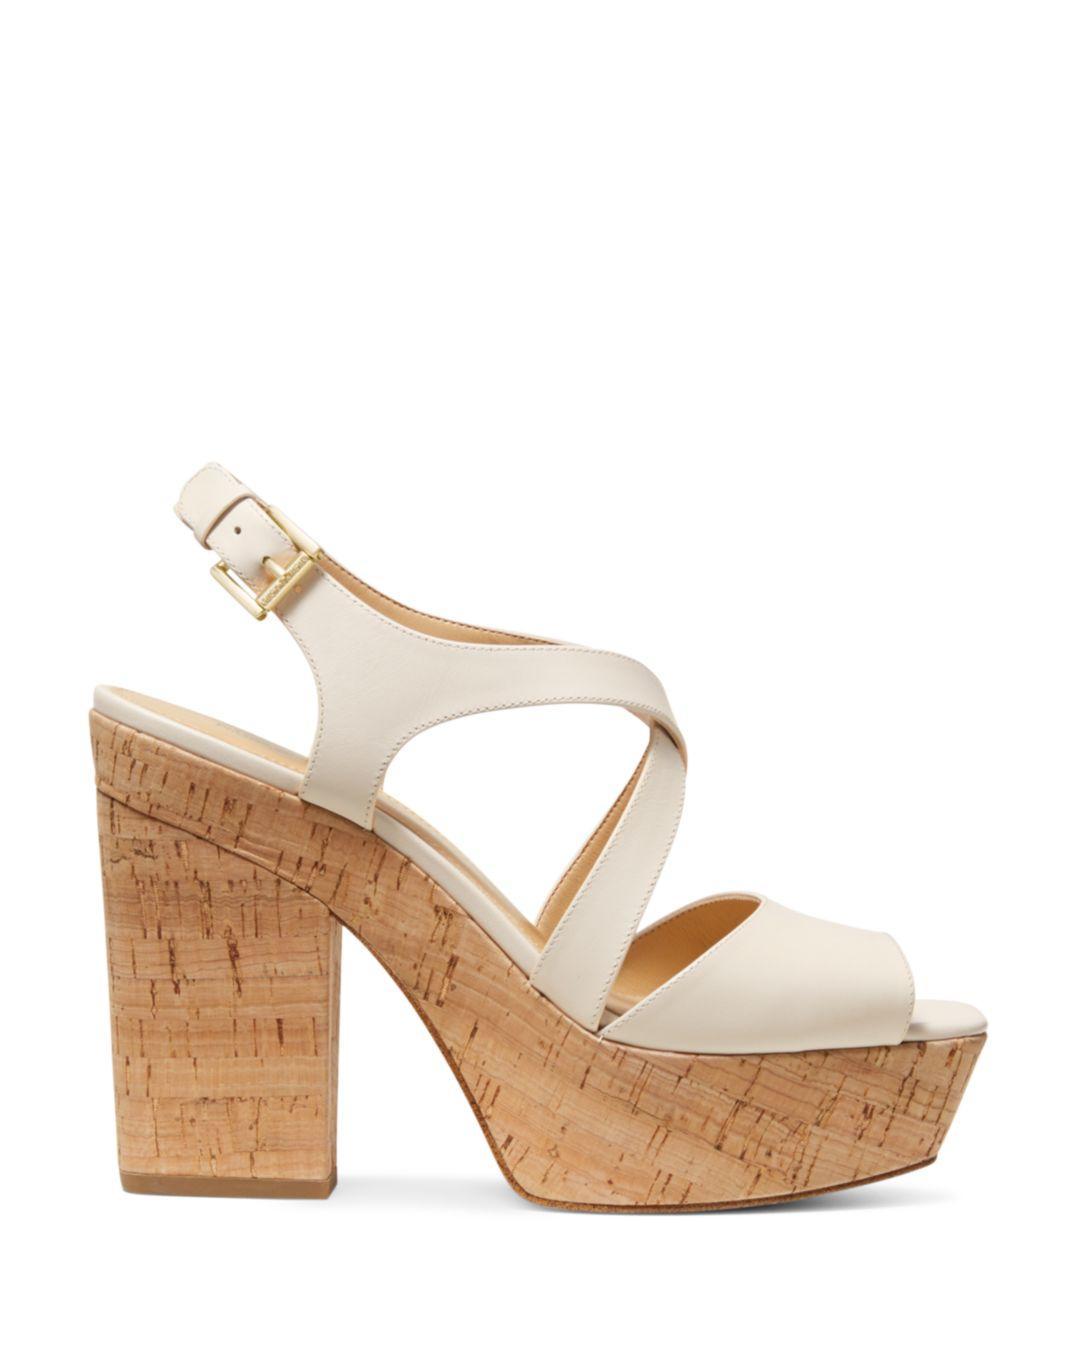 2d3c0a095cb62 Lyst - MICHAEL Michael Kors Women s Abbott Leather Platform Wedge Sandals